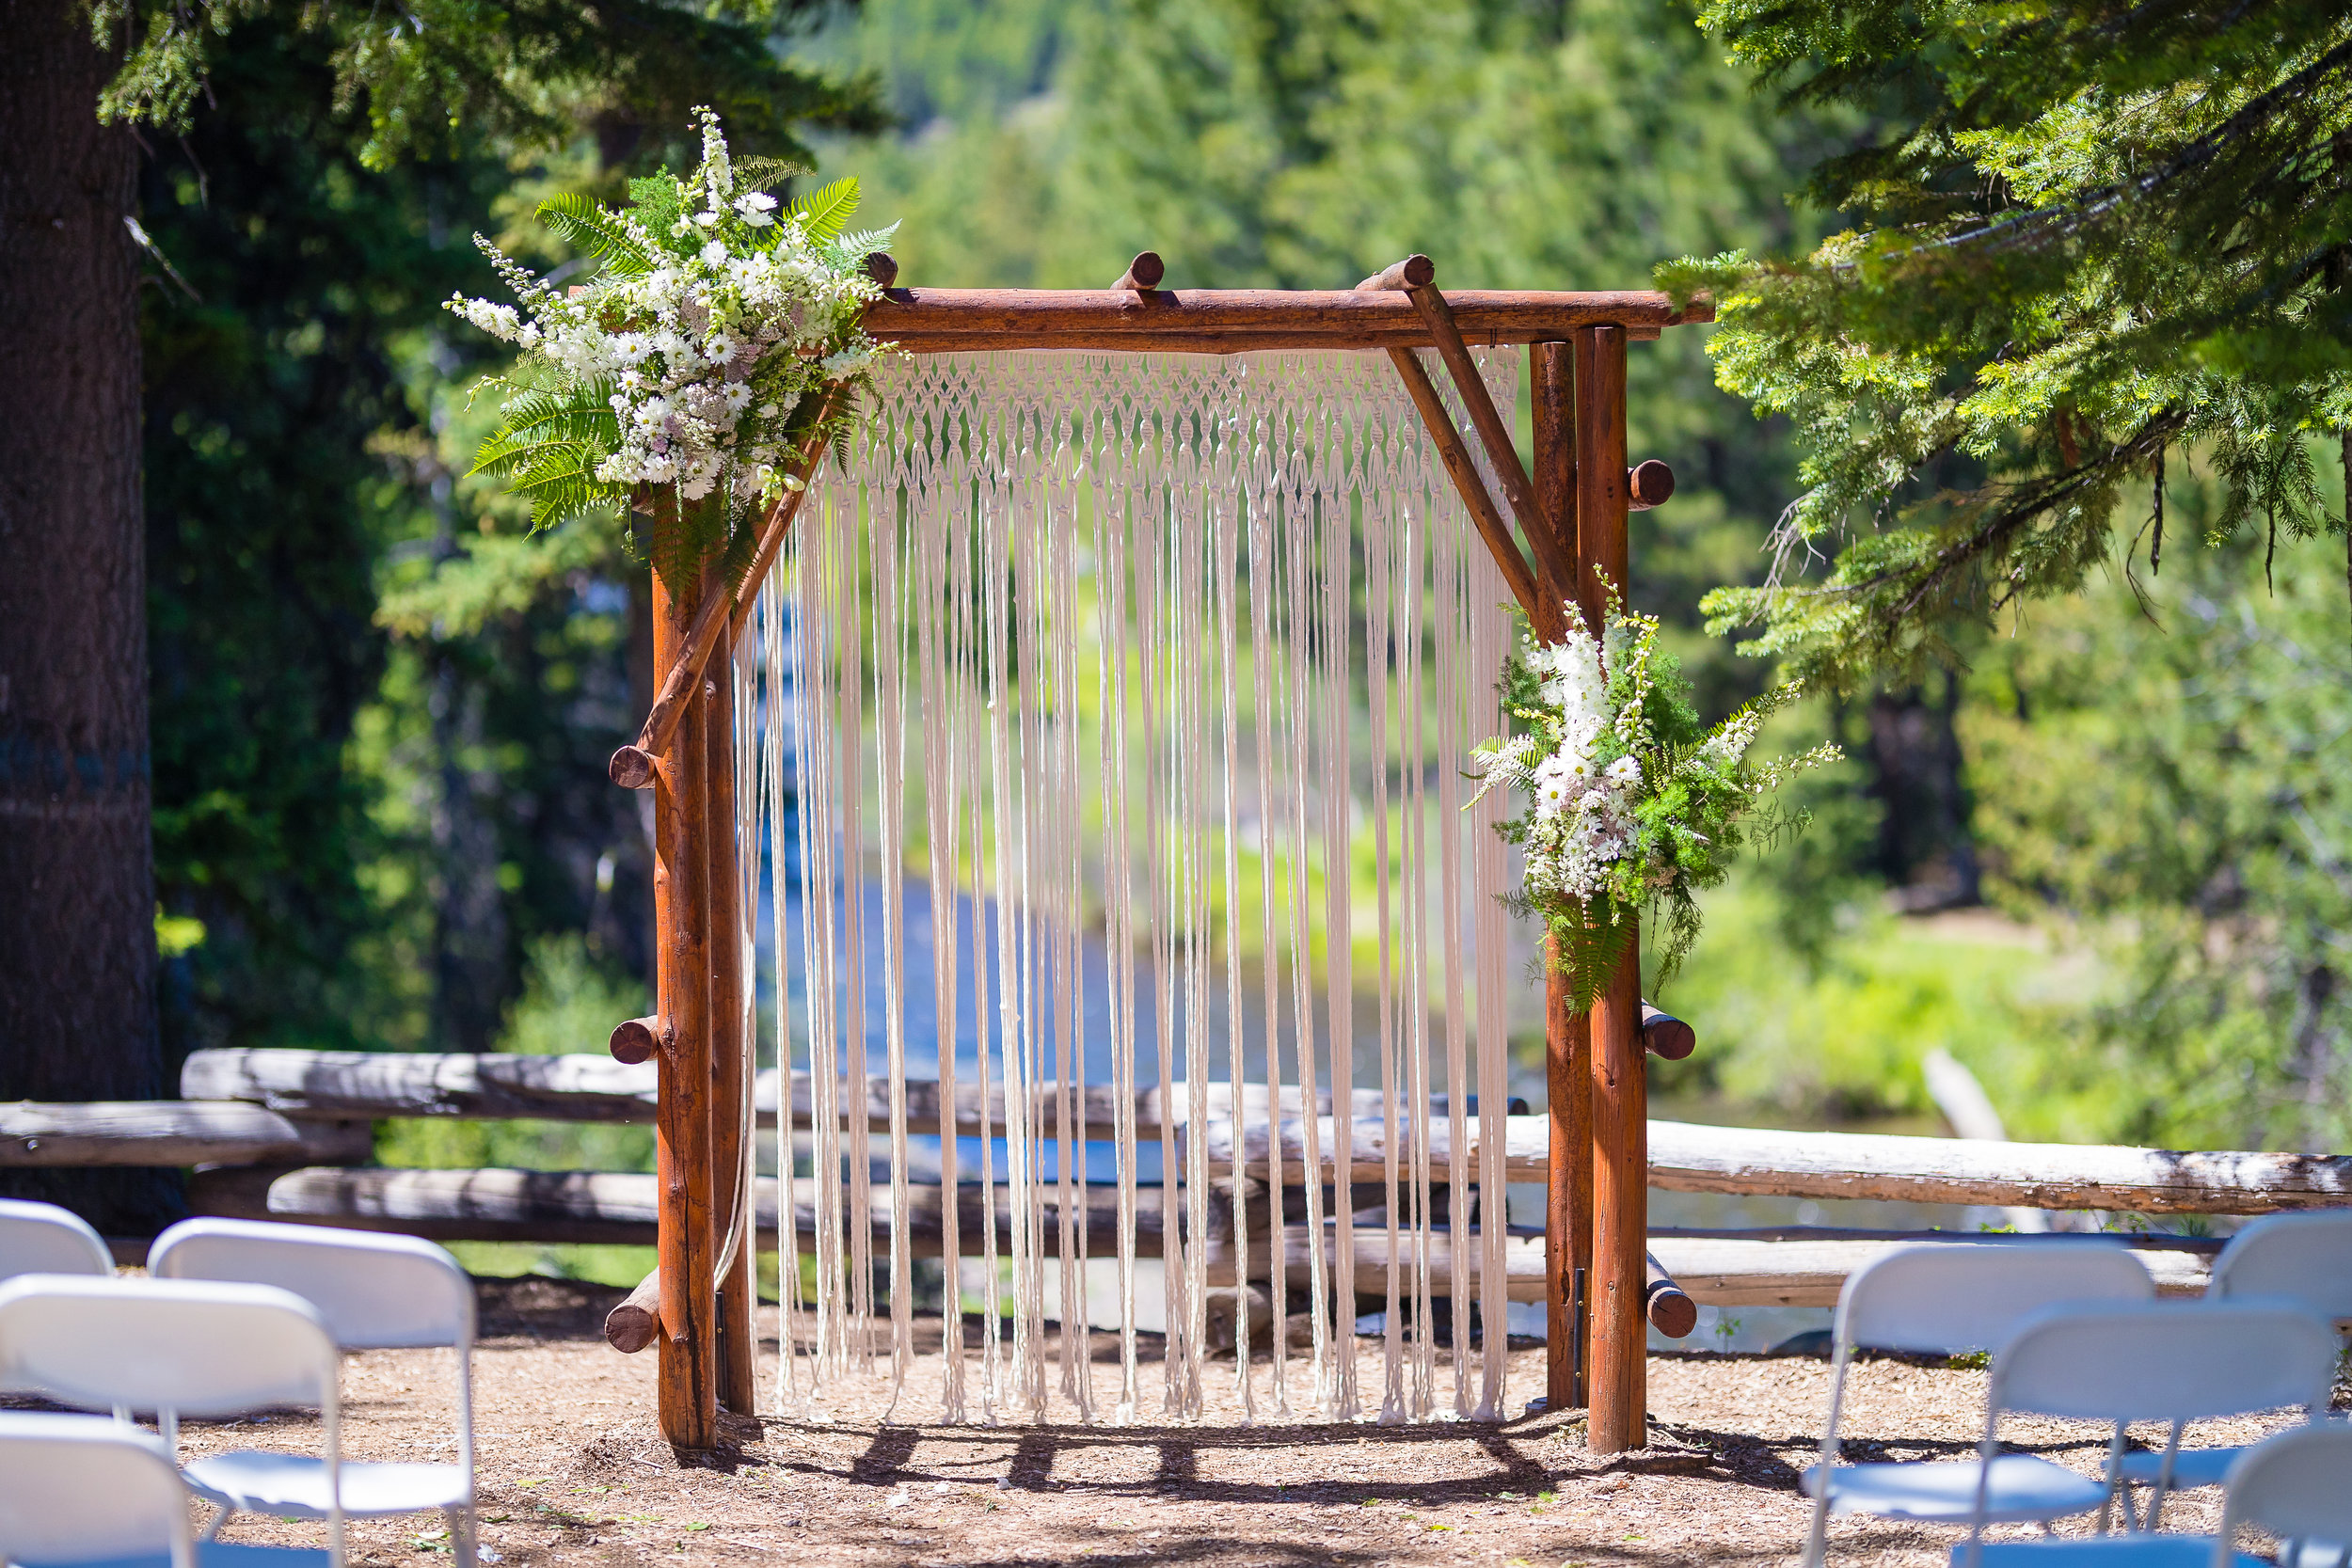 Skyliner Lodge June Wedding - Bend Oregon. Wedding Flowers by Bend Floral Artistry. Photo by Story Lantern  www.storylantern.com    Your Local Bend, Oregon Bespoke Florist.